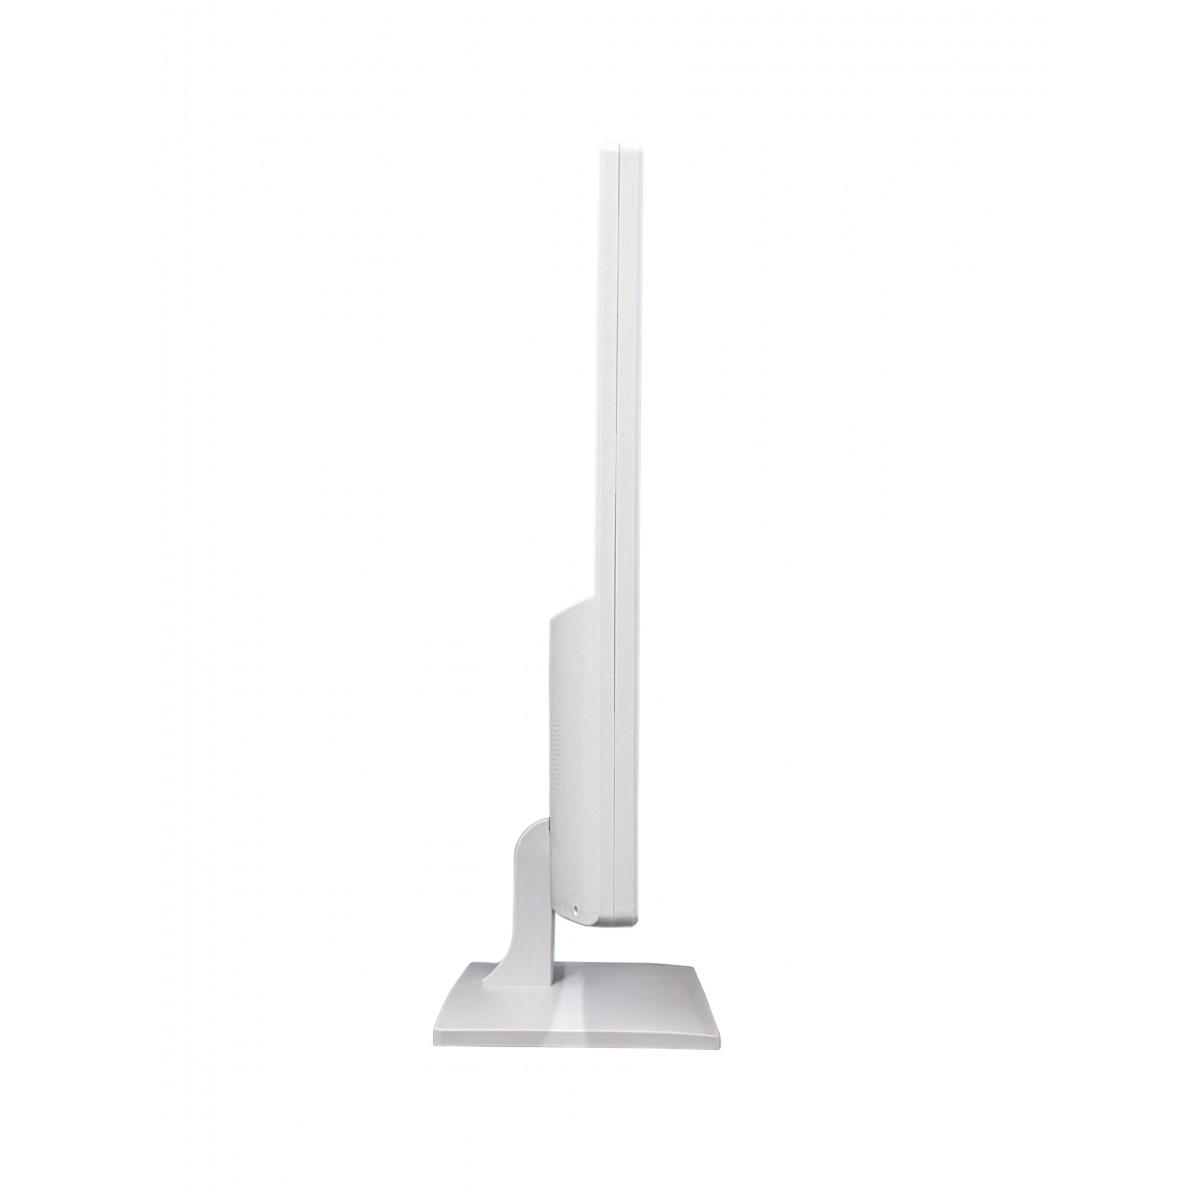 Monitor Gamer HQ LED 21.5 Pol, Full HD, HDMI/VGA, 21.5WHQ-LED - White